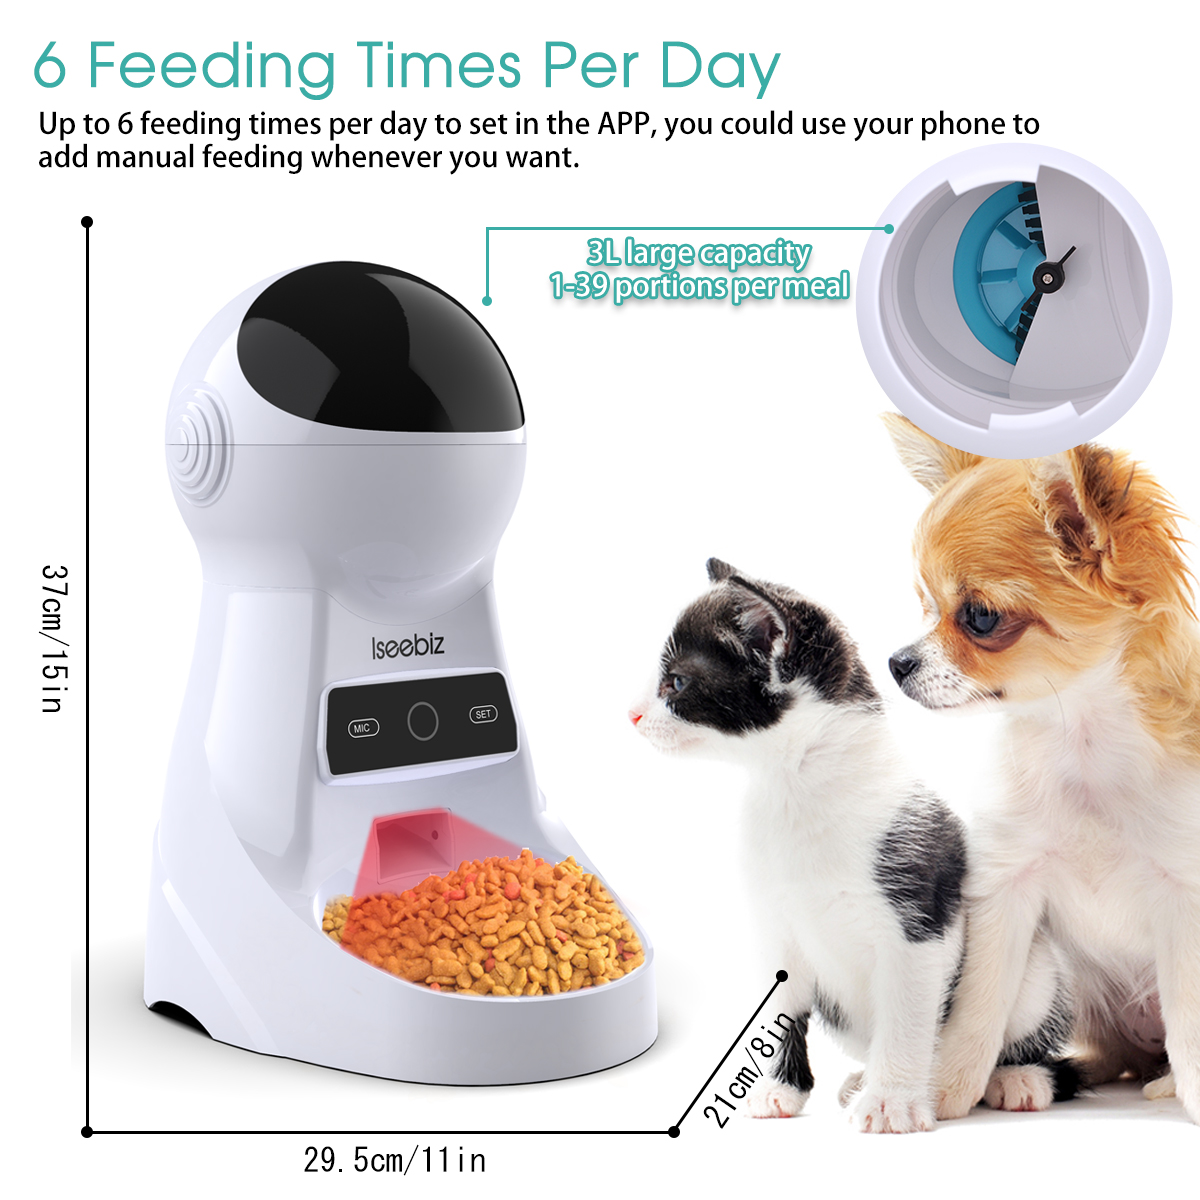 Iseebiz 3L Automatic Pet Feeder With Voice Record Pets food Bowl 21 » Pets Impress